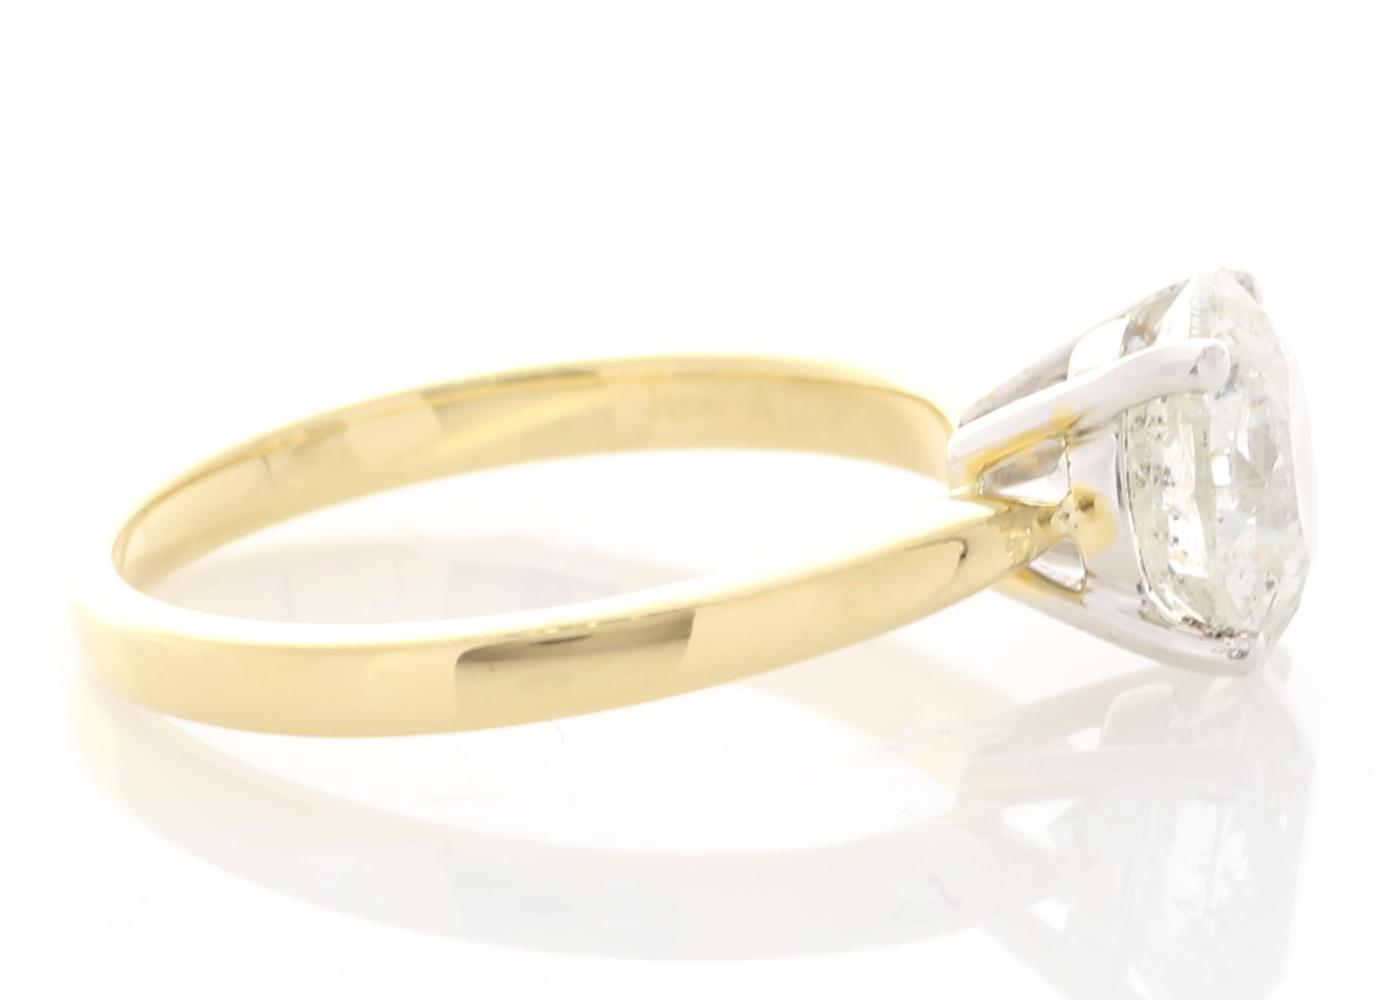 18ct Yellow Gold Prong Set Diamond Ring 2.21 Carats - Image 4 of 5